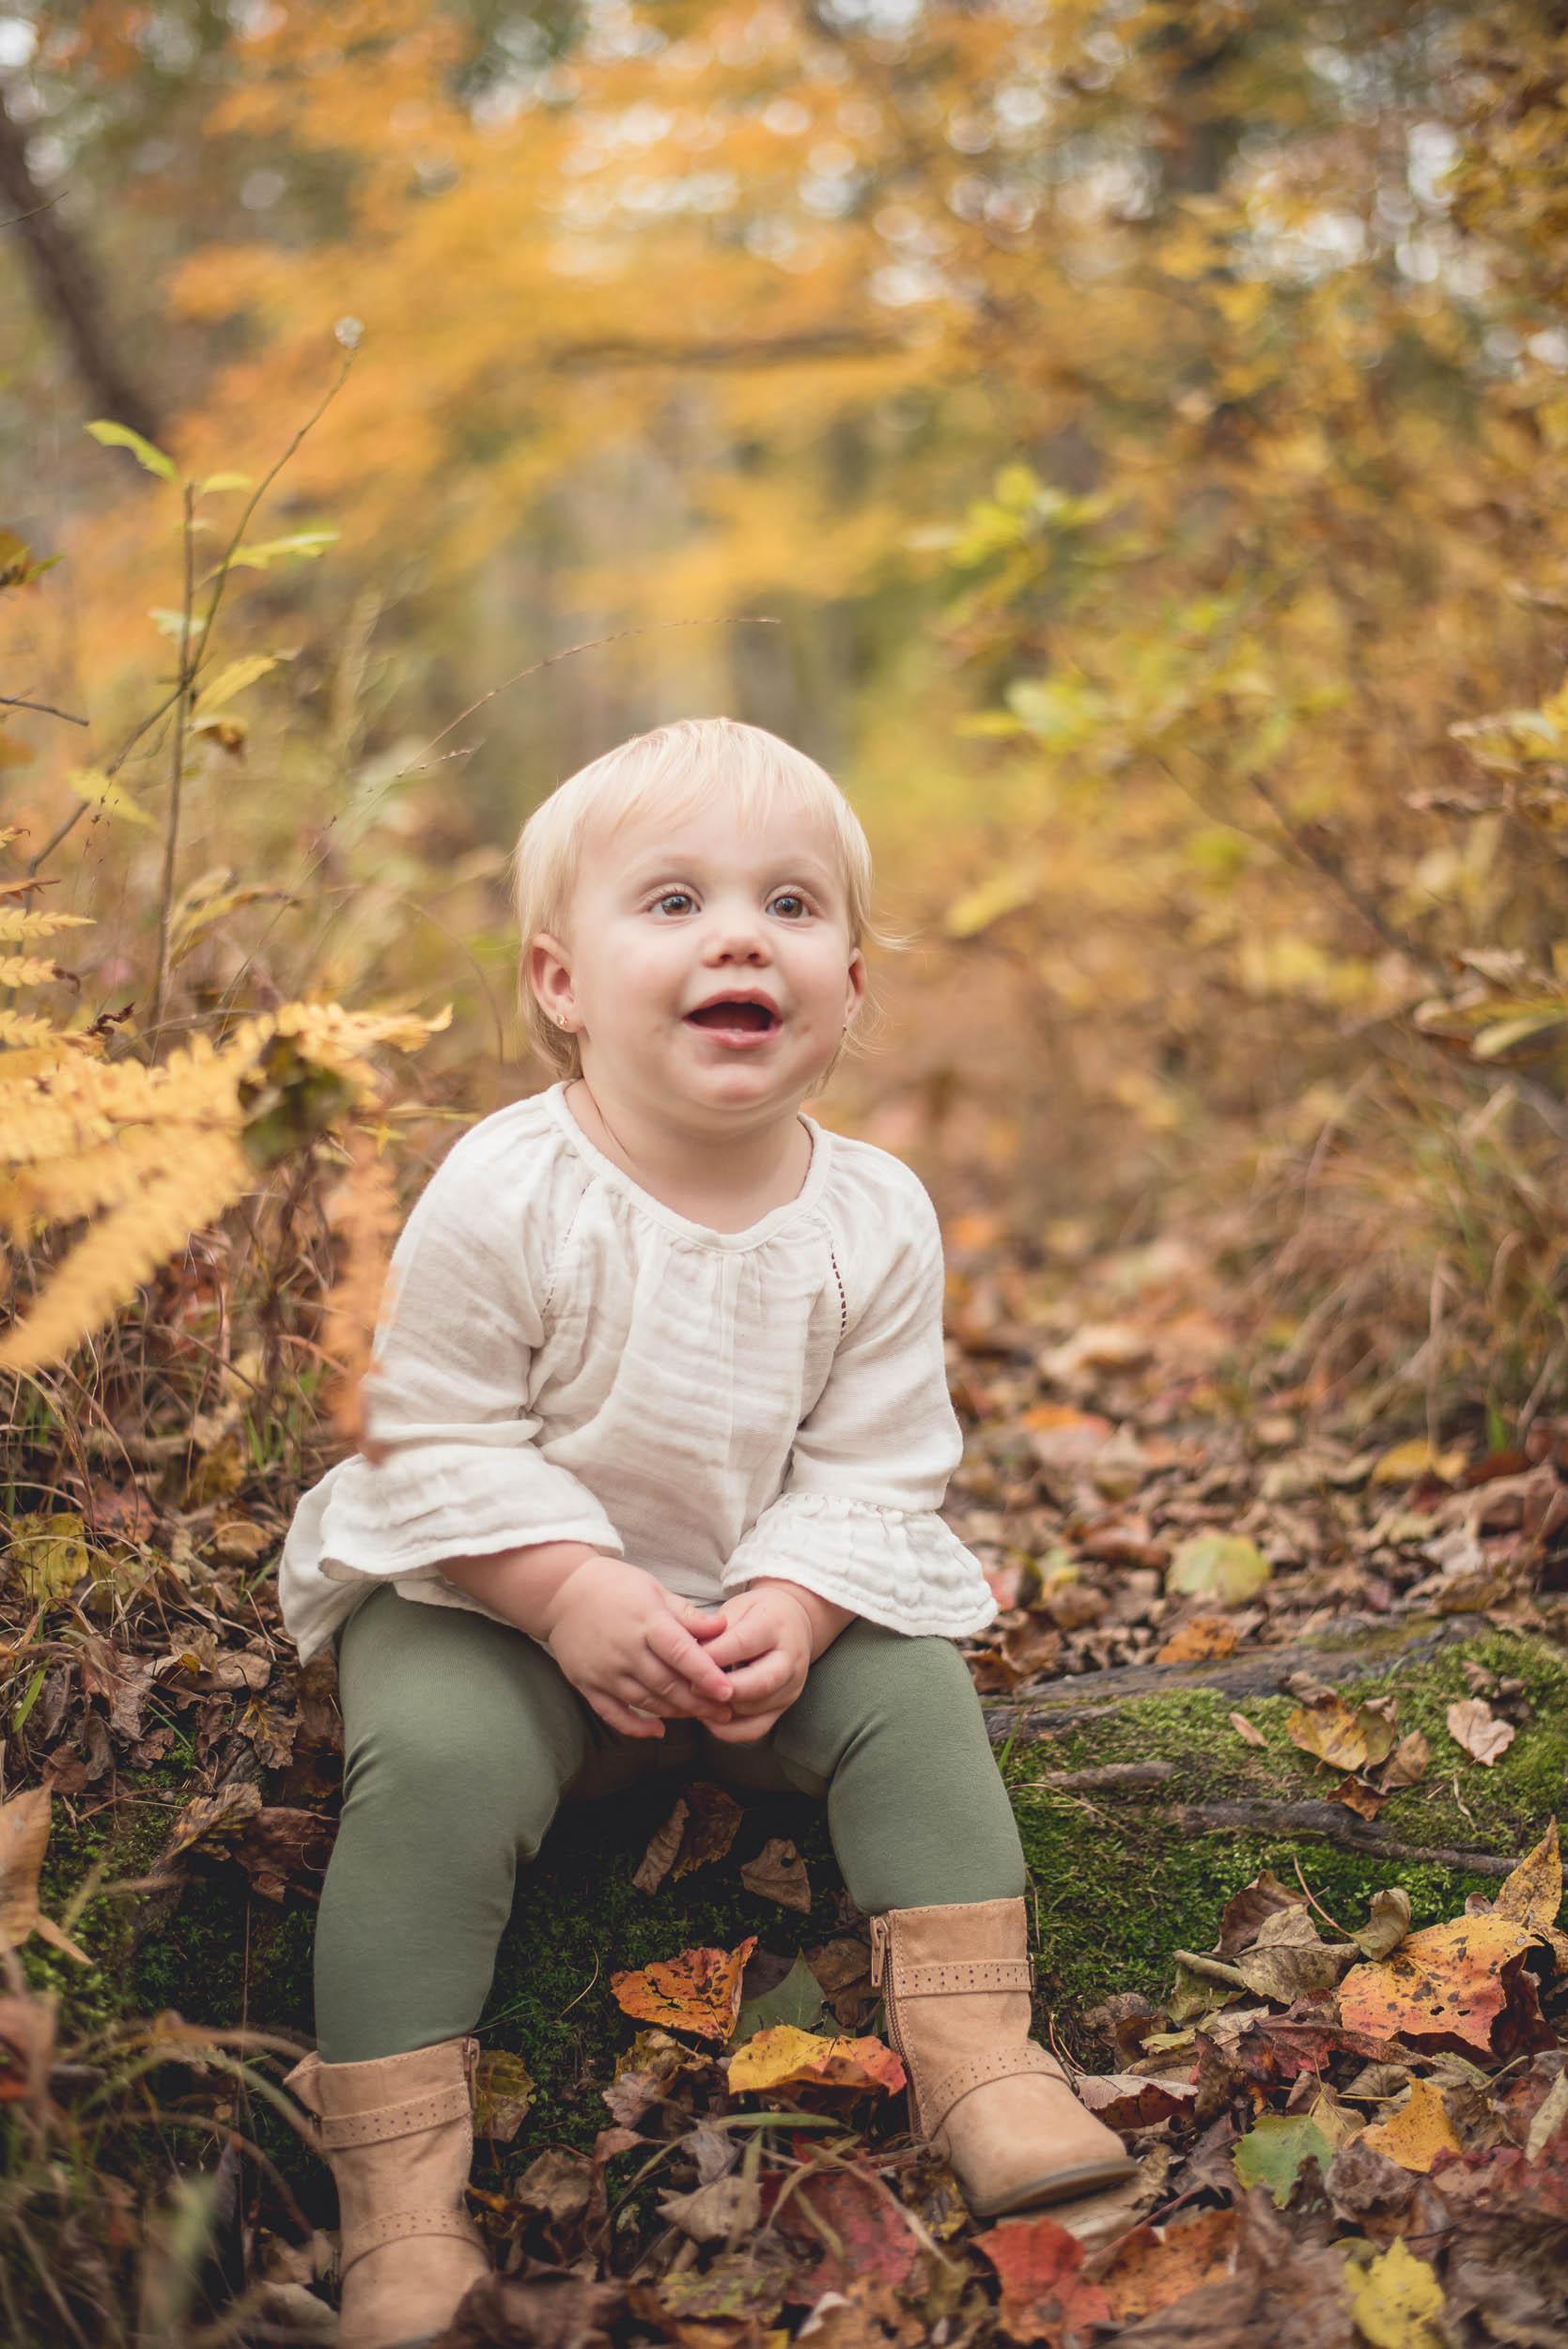 Ramsey_Child_Family_Photo_Session_Maryland_Crofton_Gambrills(5of12).jpg